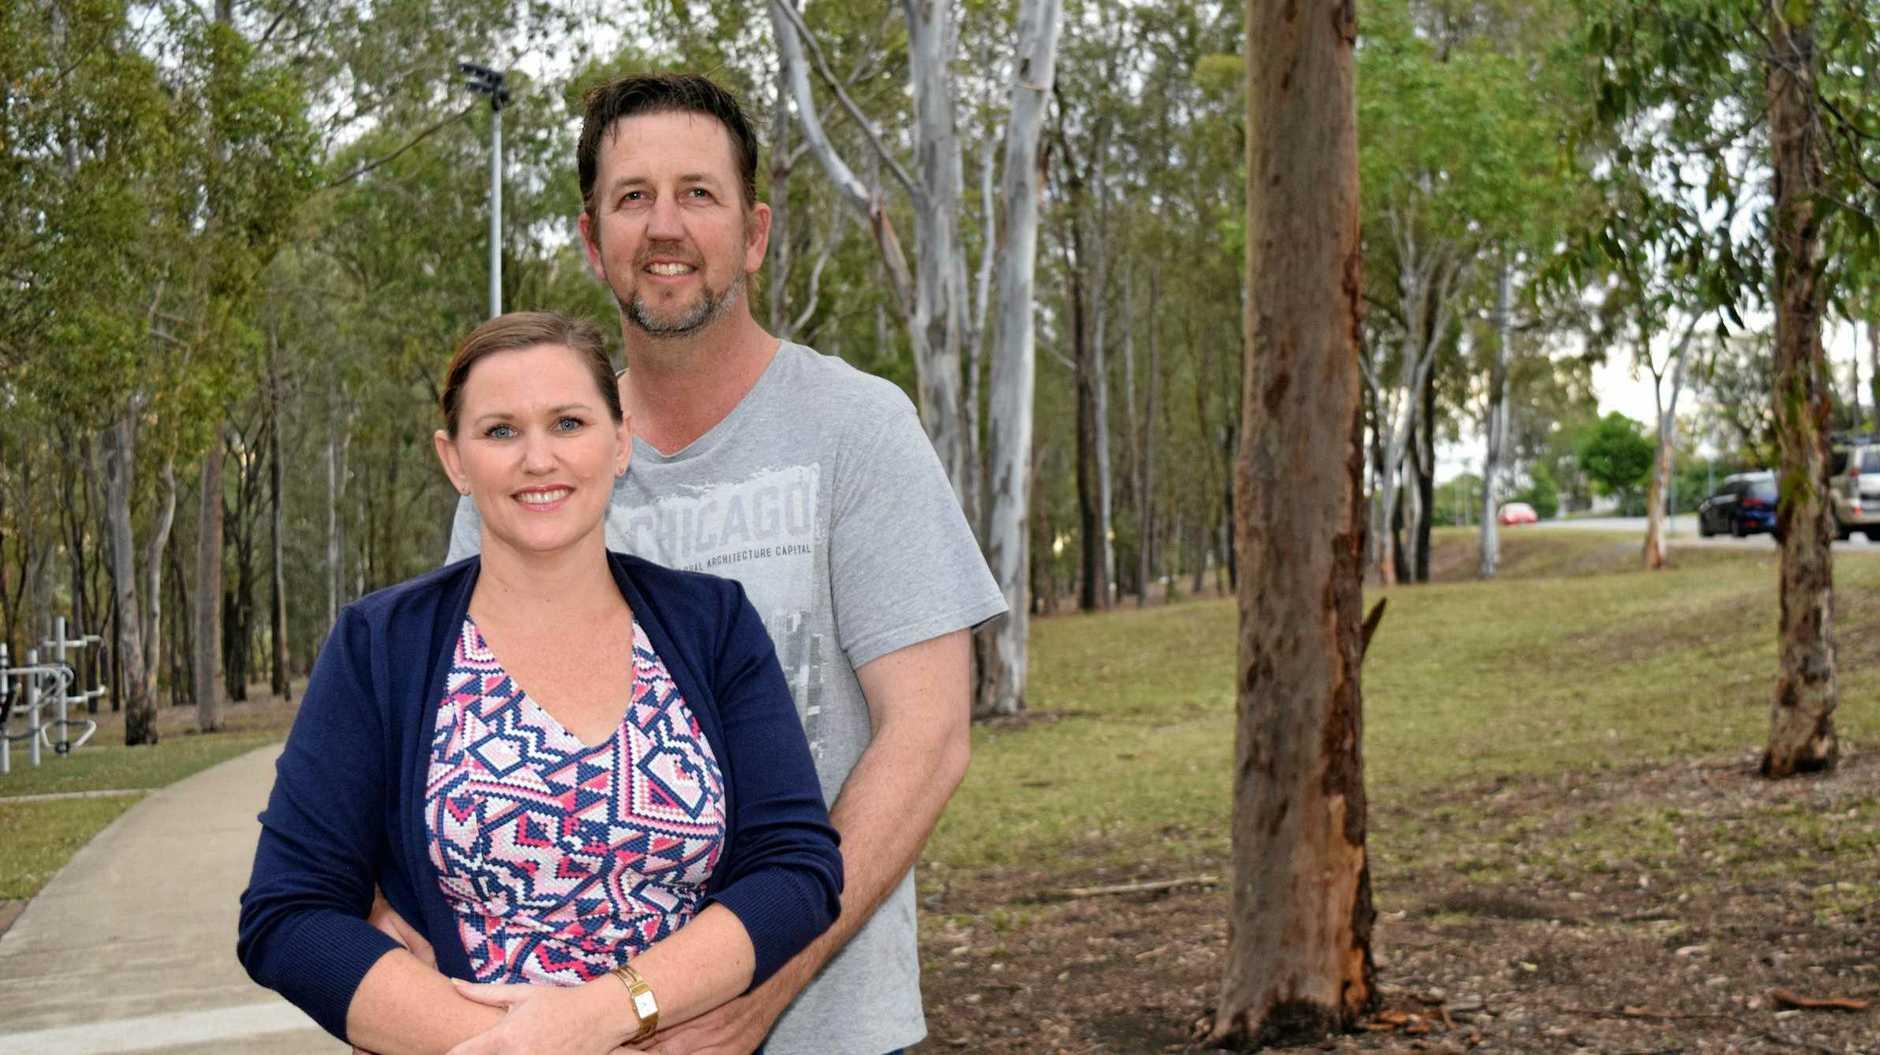 Matt and Fiona Ralston who call themselves 'The Accidental Renovators'